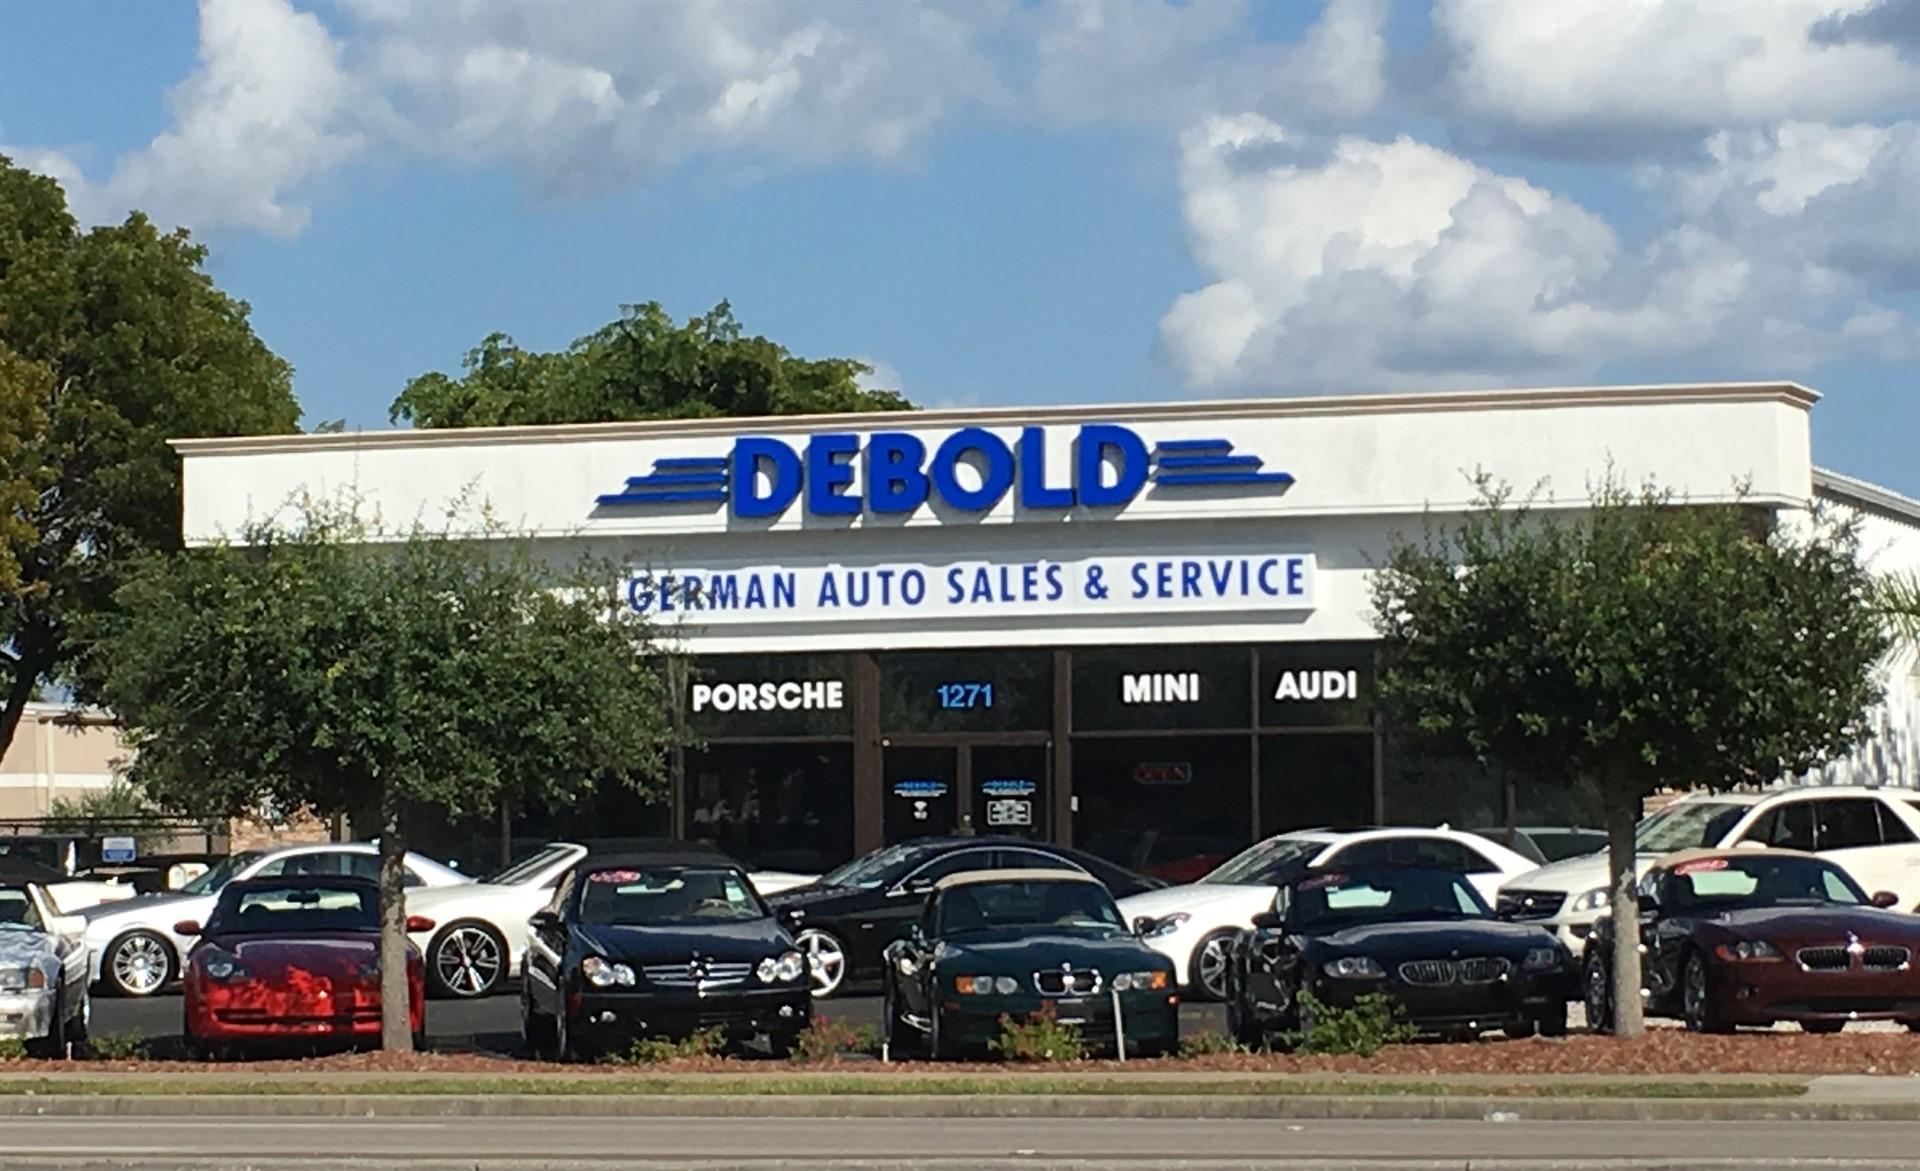 Car Dealerships Naples Fl >> Debold German Auto Sales Service